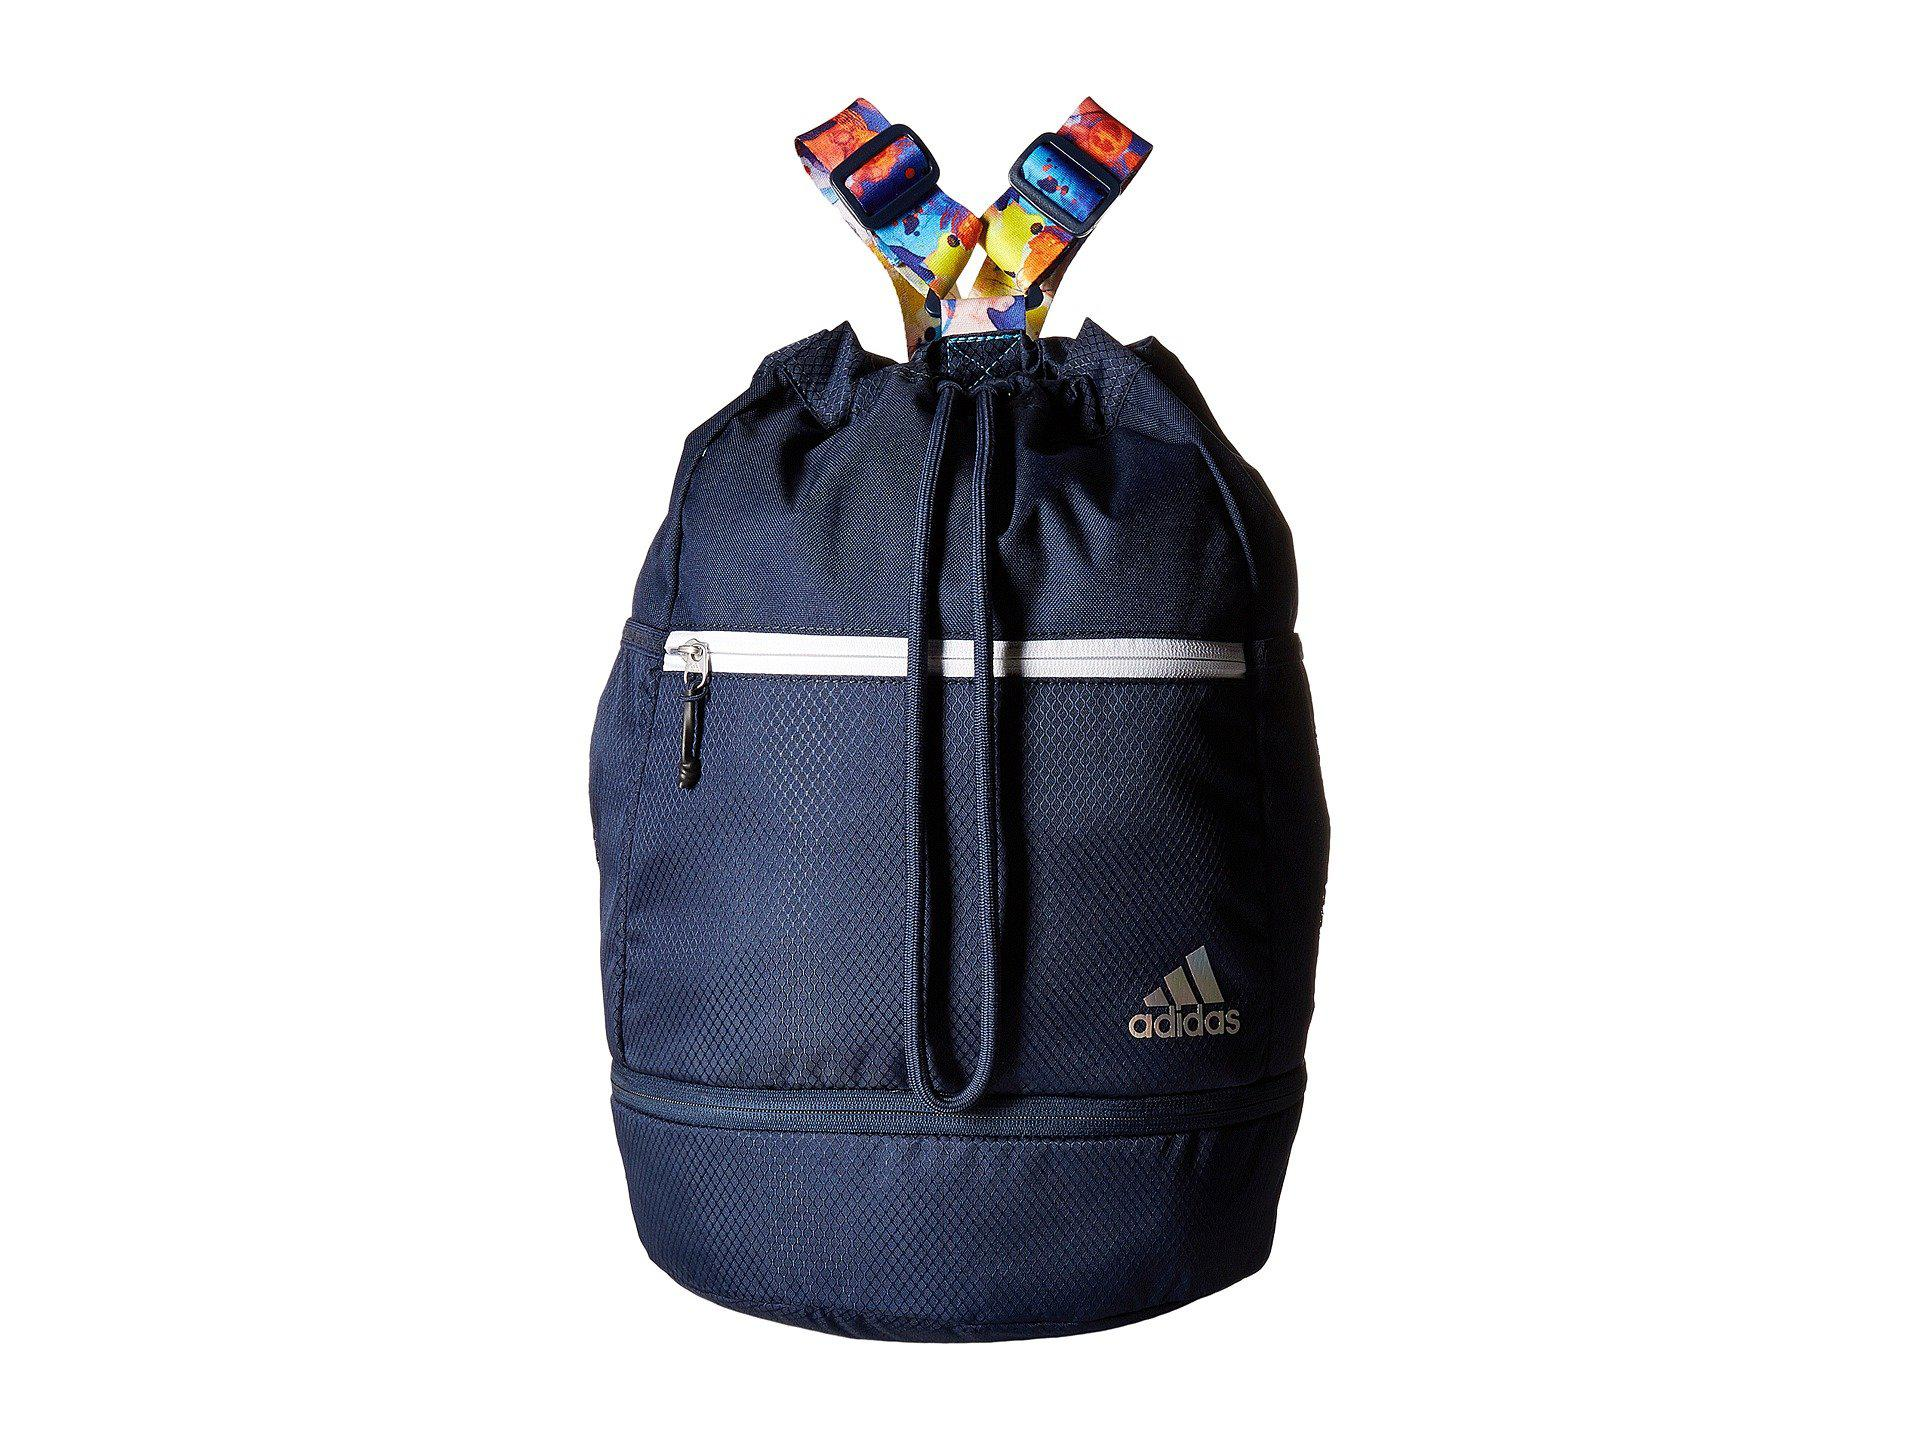 Adidas - Blue Squad Bucket Backpack (black black Jersey) Backpack Bags -  Lyst. View fullscreen 11486c854784f